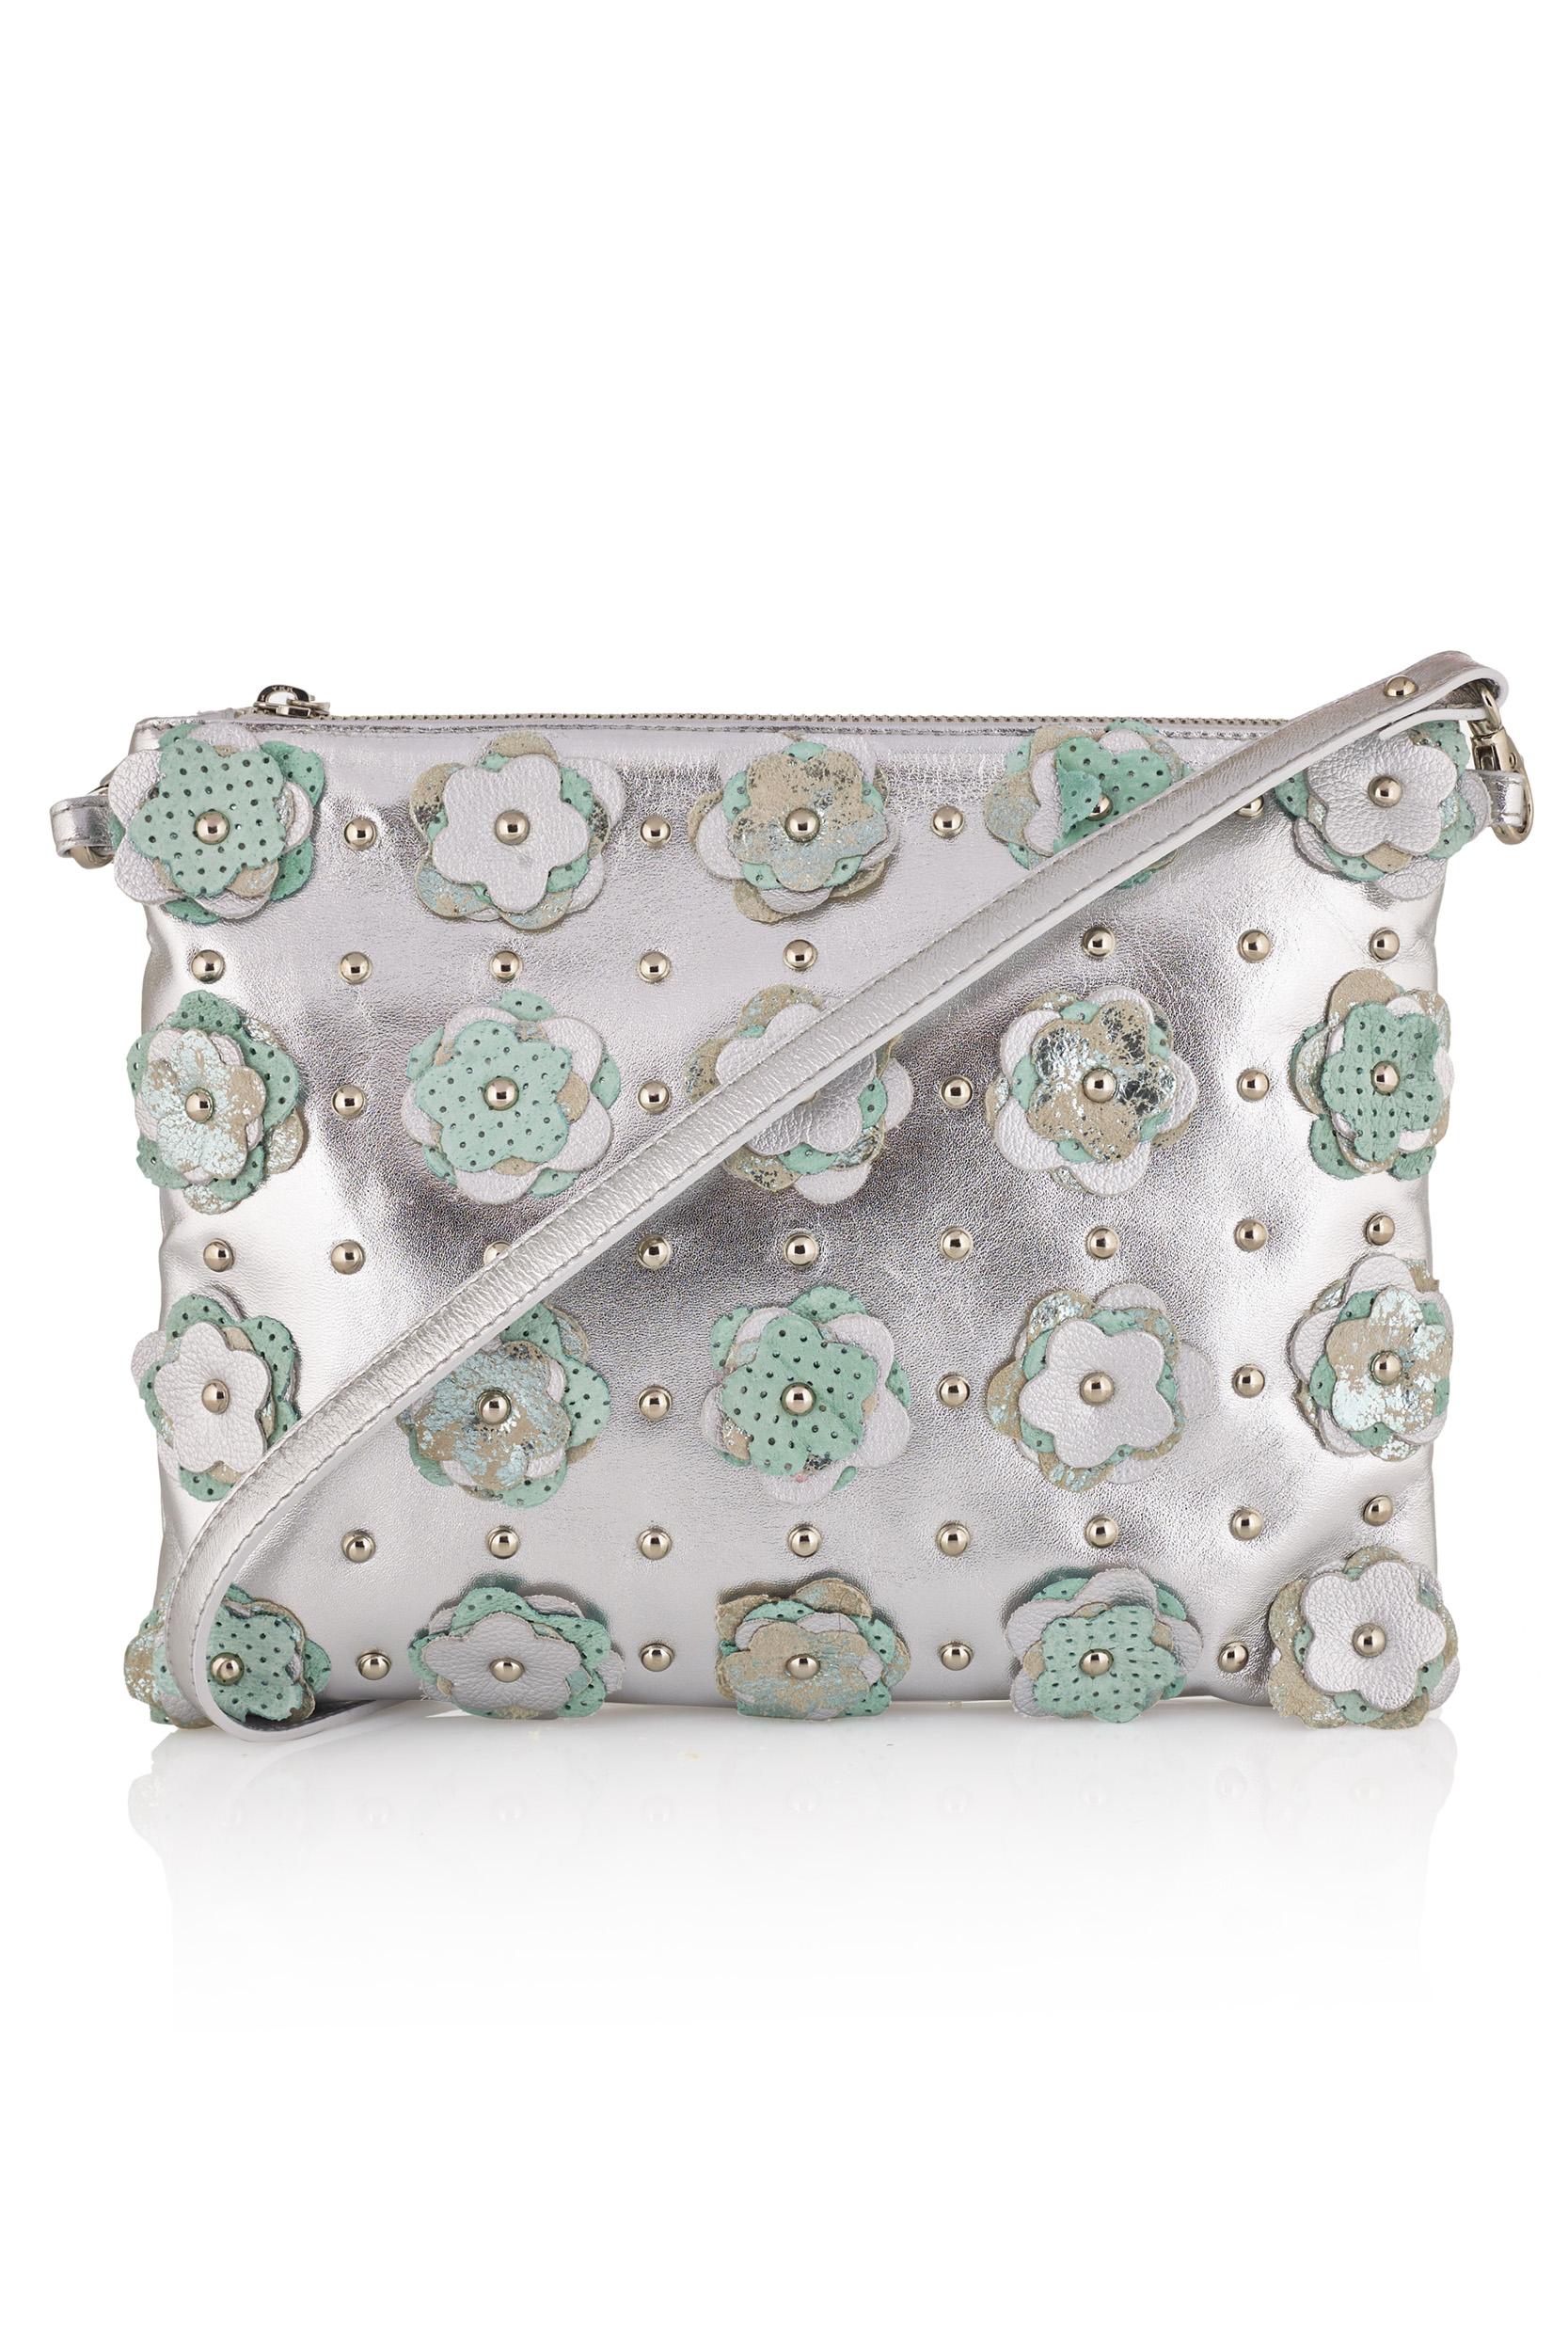 Manley Bag